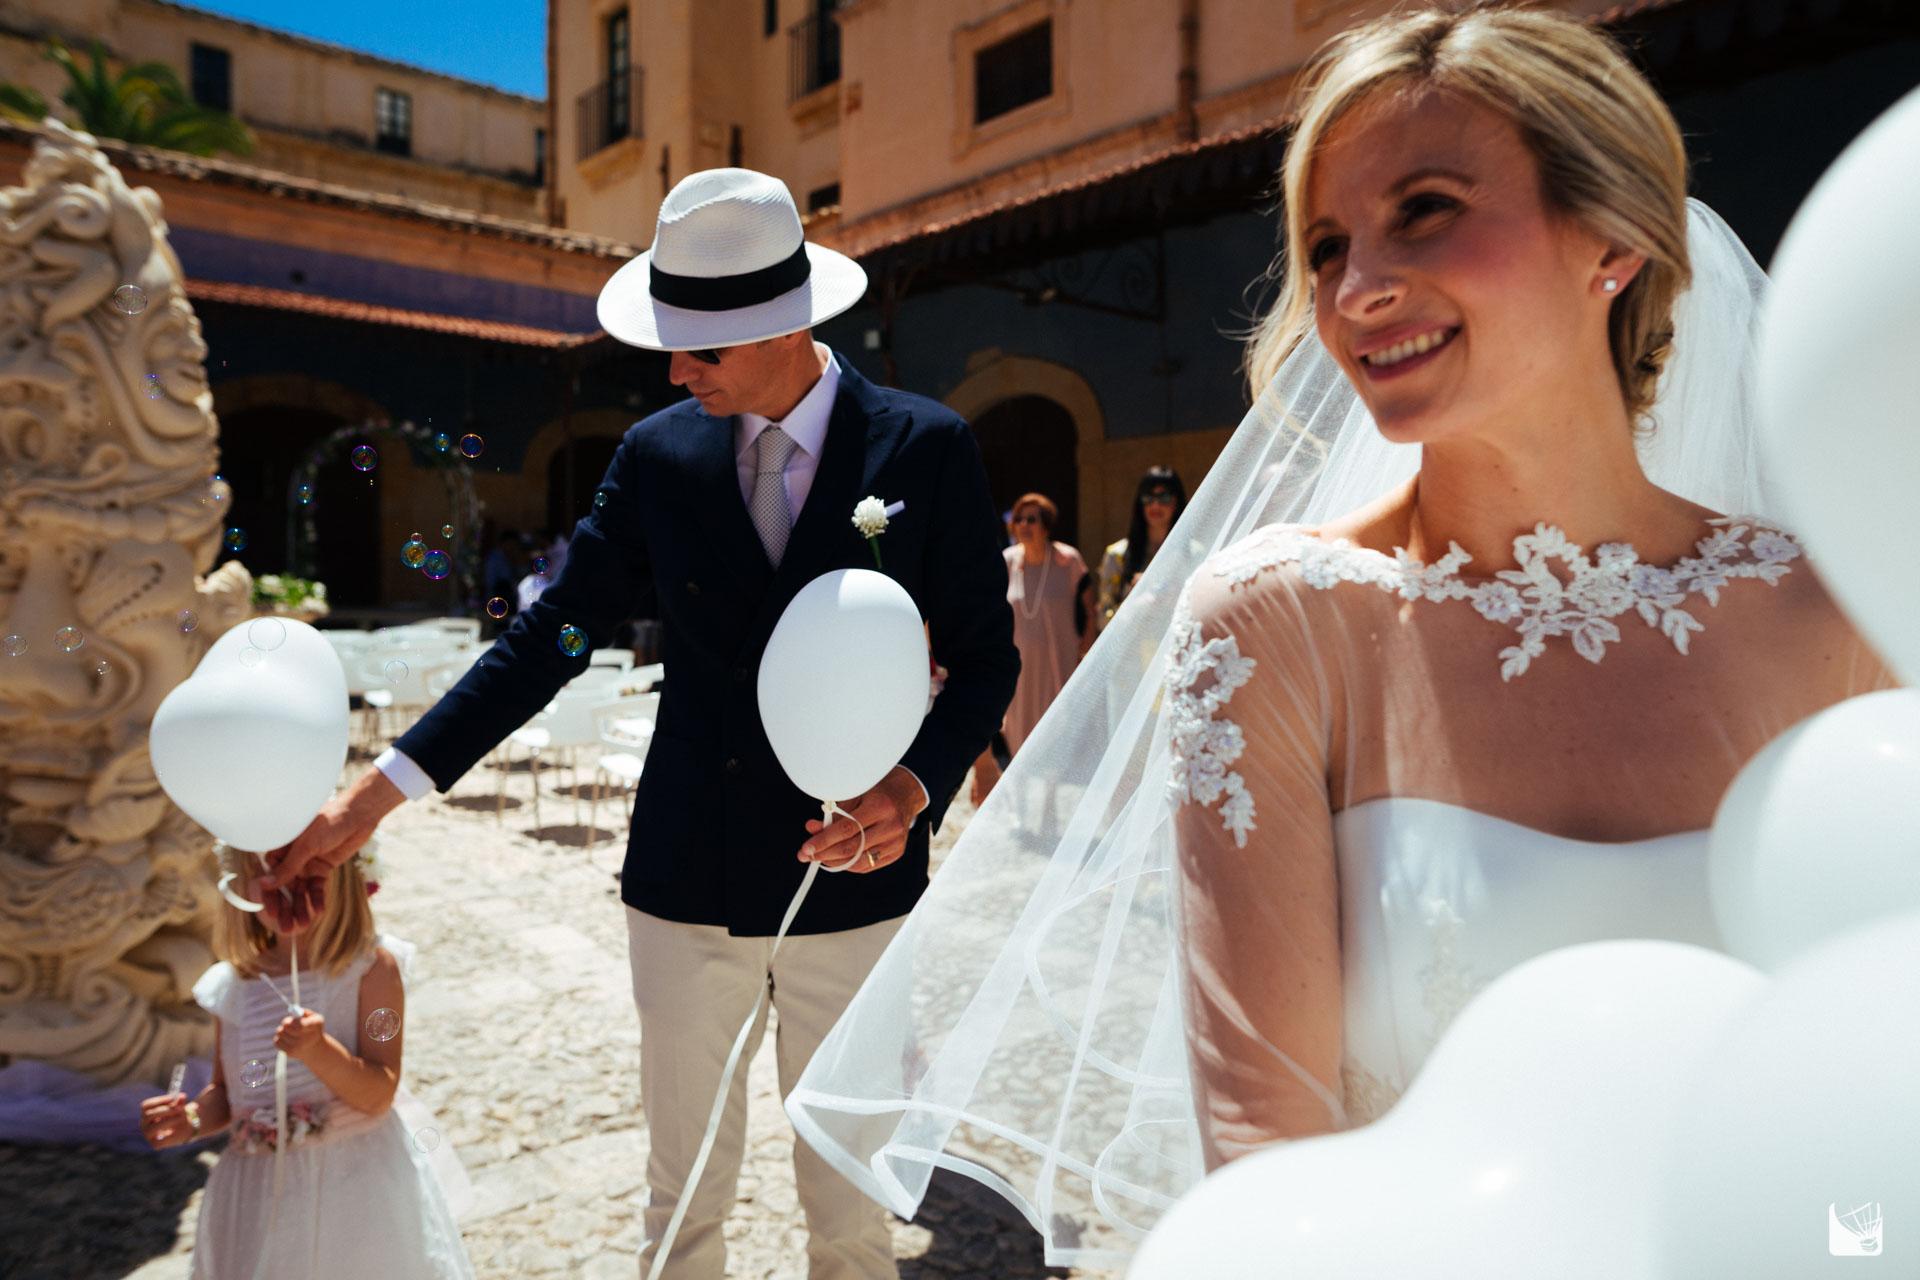 wedding_in_marzamemi-27.jpg